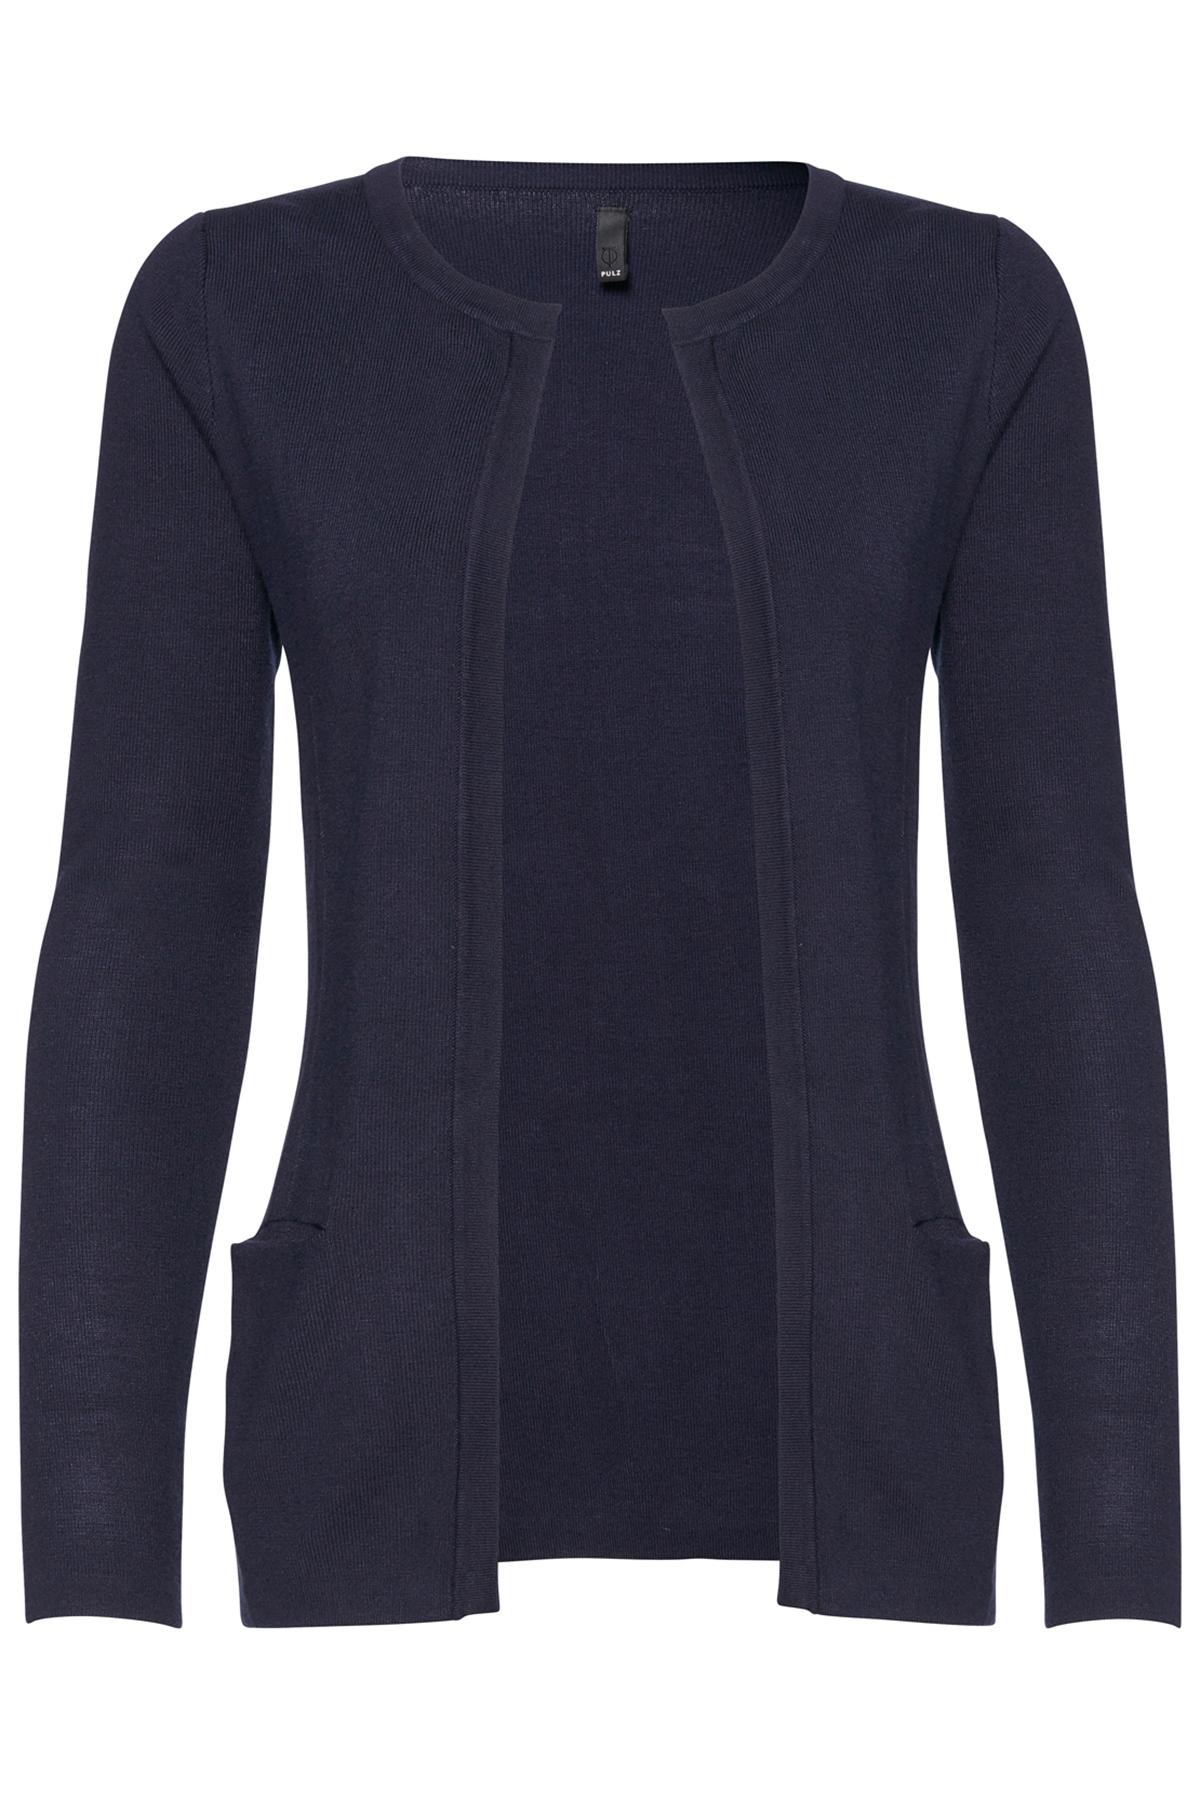 Pulz Jeans Dame Cardigan - Marineblå